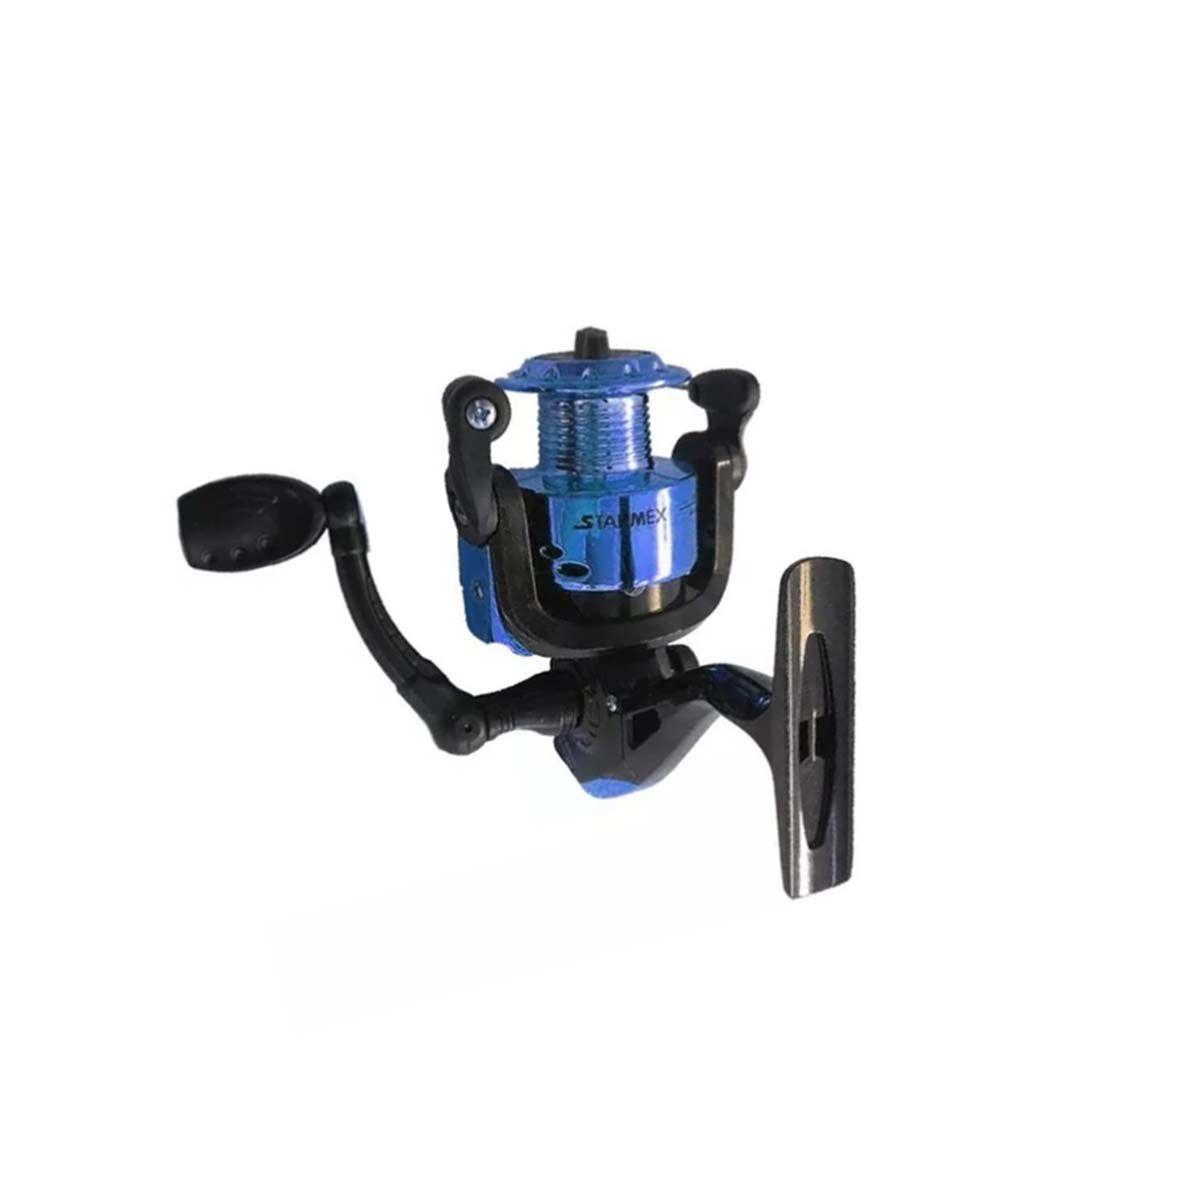 Molinete Starmex Hybrid 3000  - Pró Pesca Shop